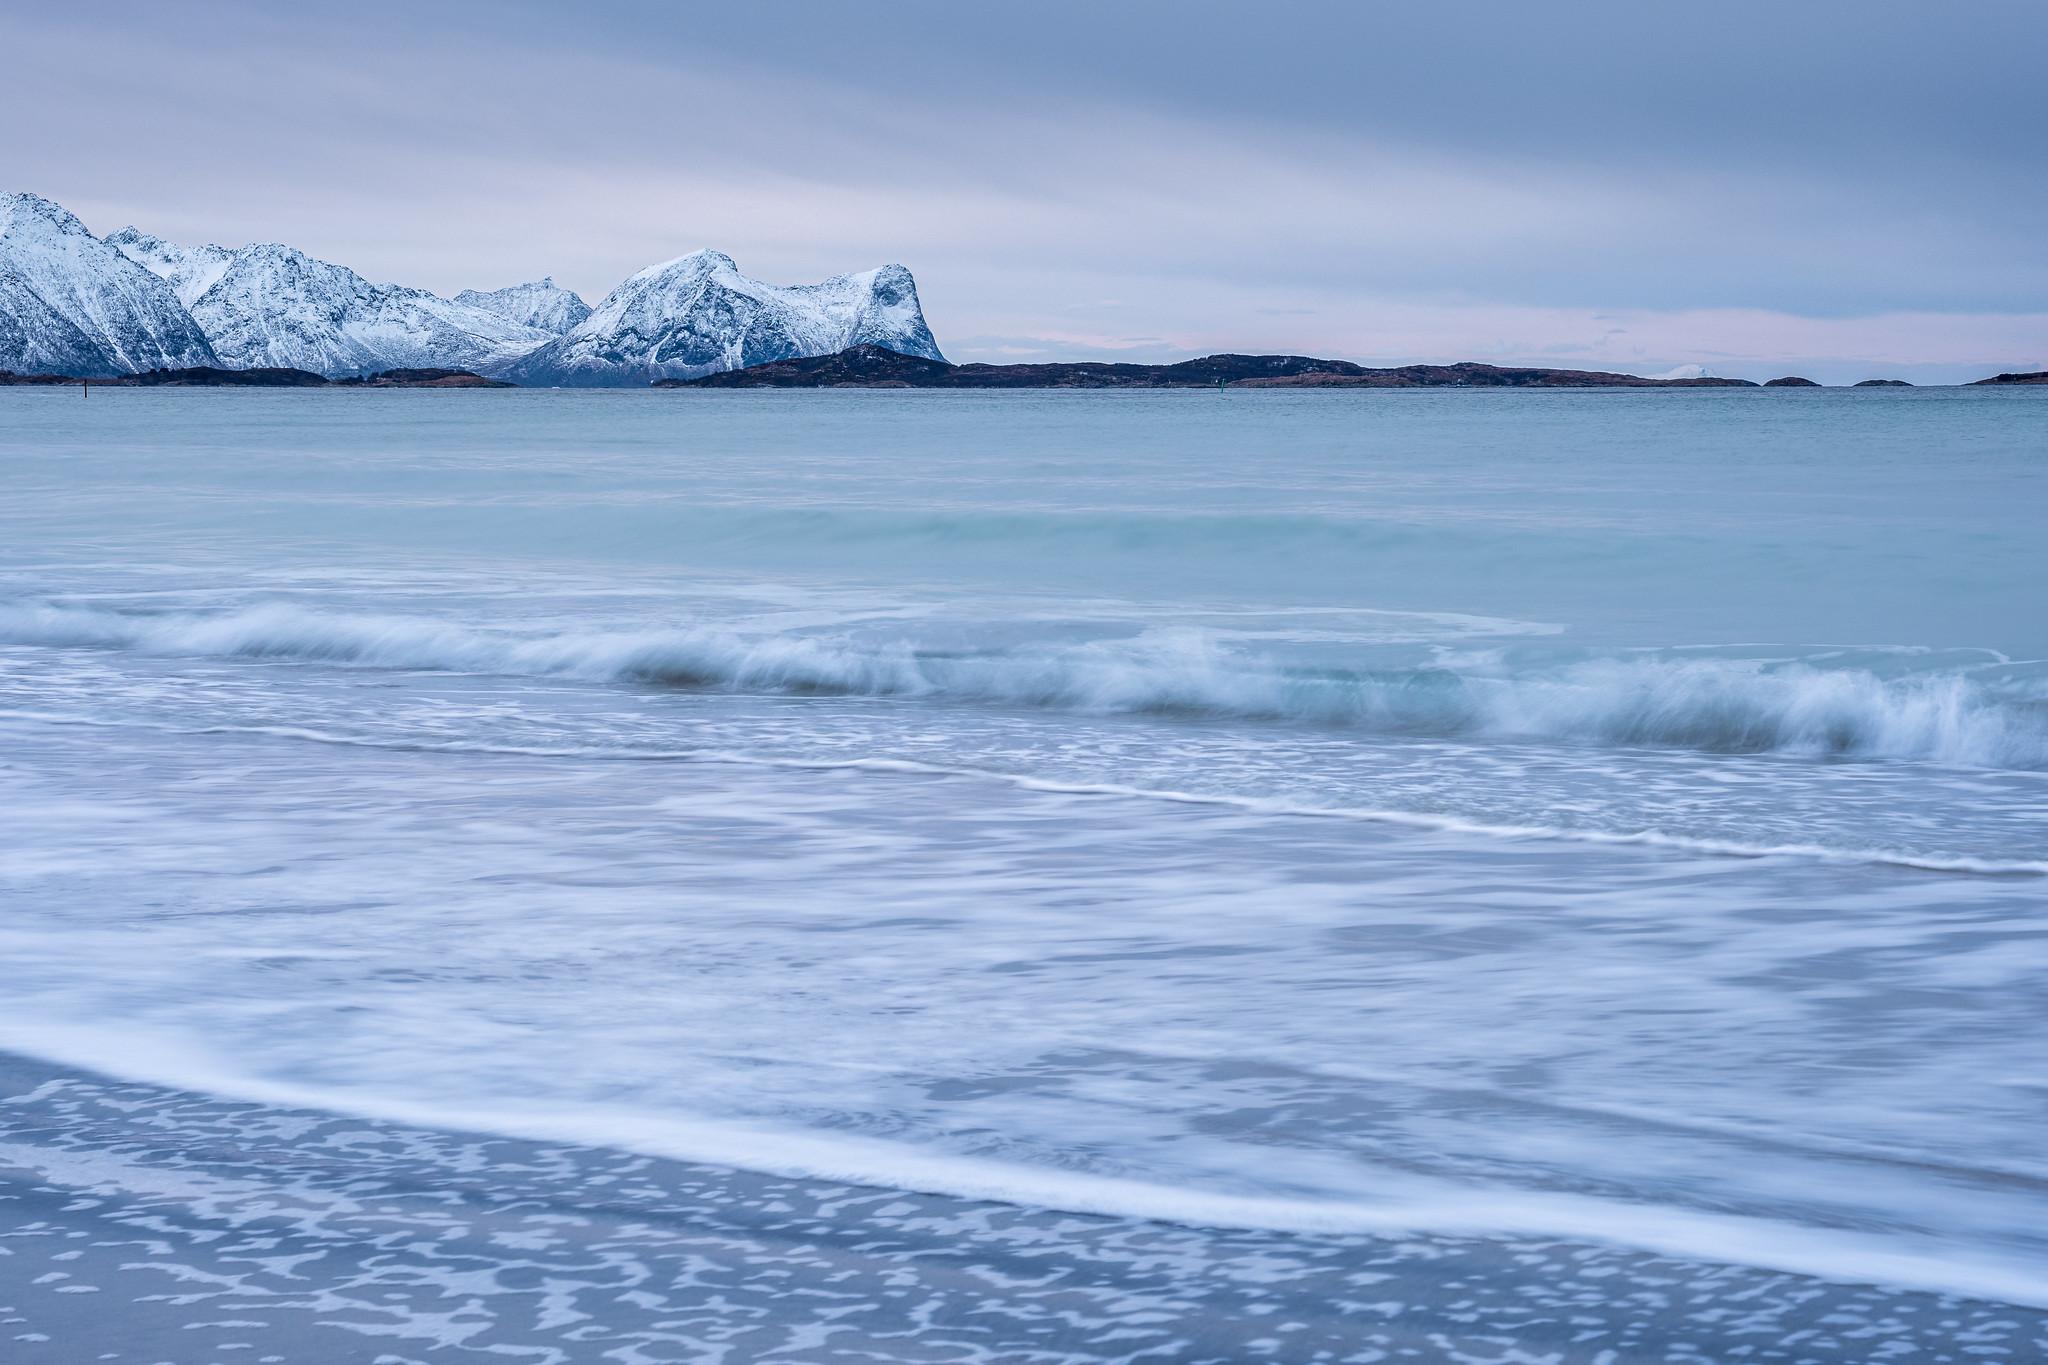 Spiel der Wellen am Strand bei Bøvaer hinter Skaland